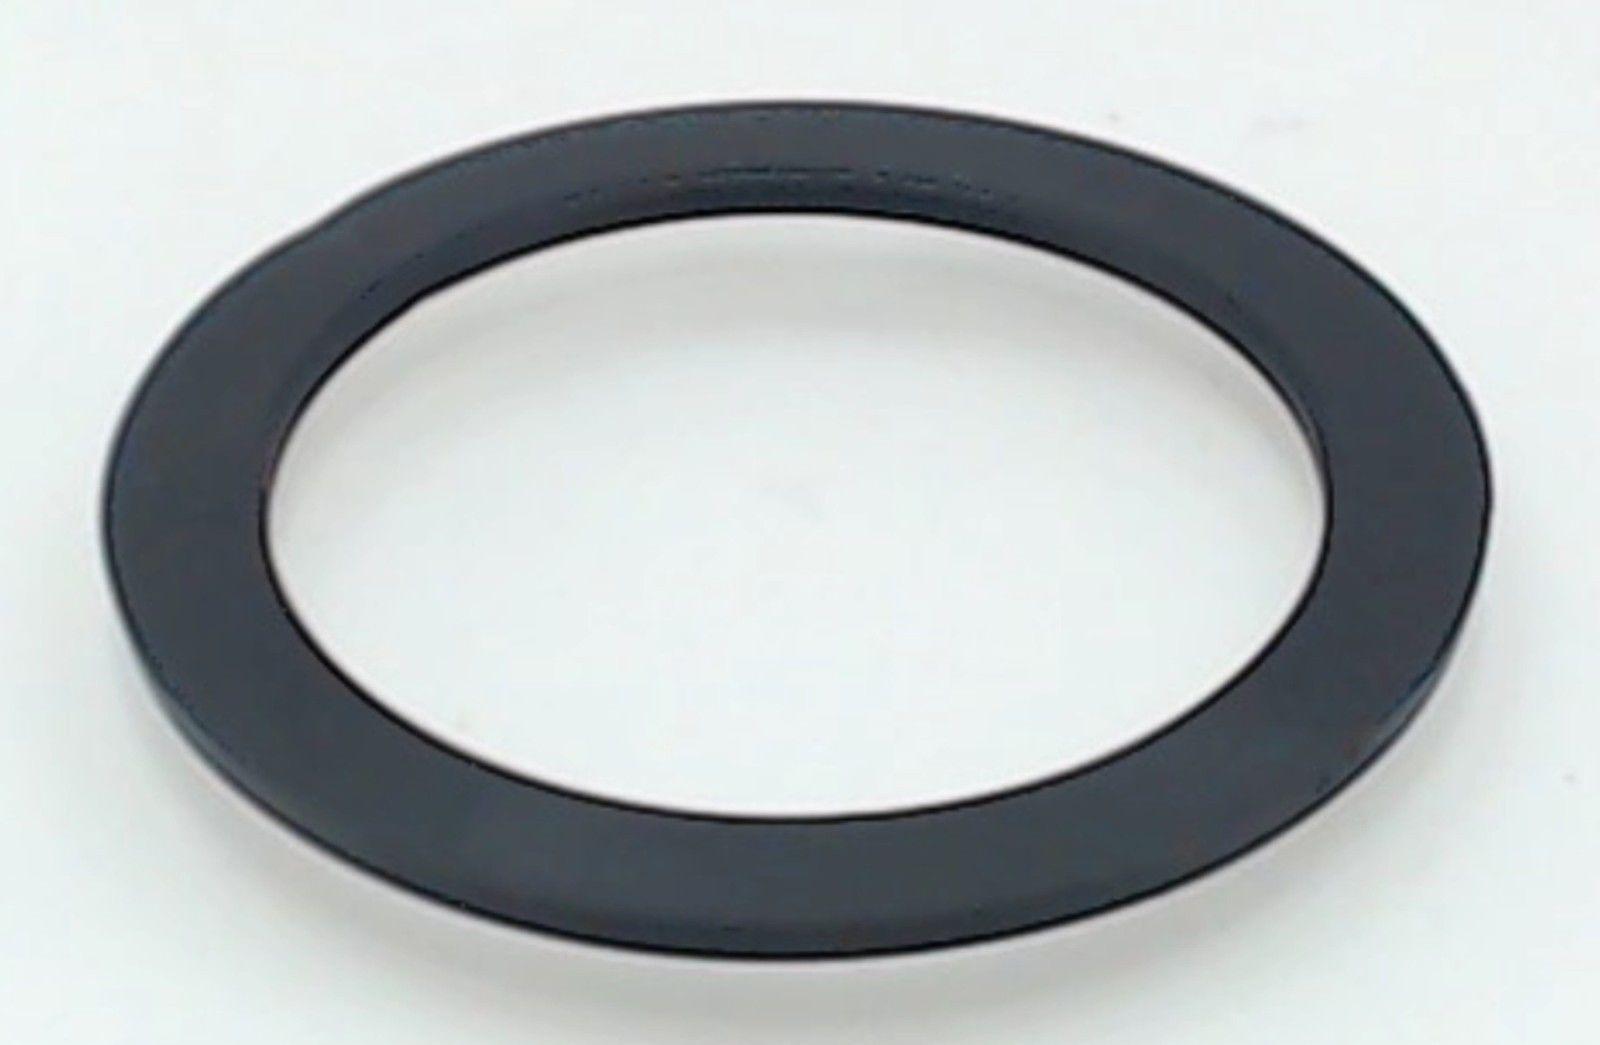 Ge Blender Model 169202 Parts And Accessories ~ Kitchenaid blender jar gasket seal ap ps